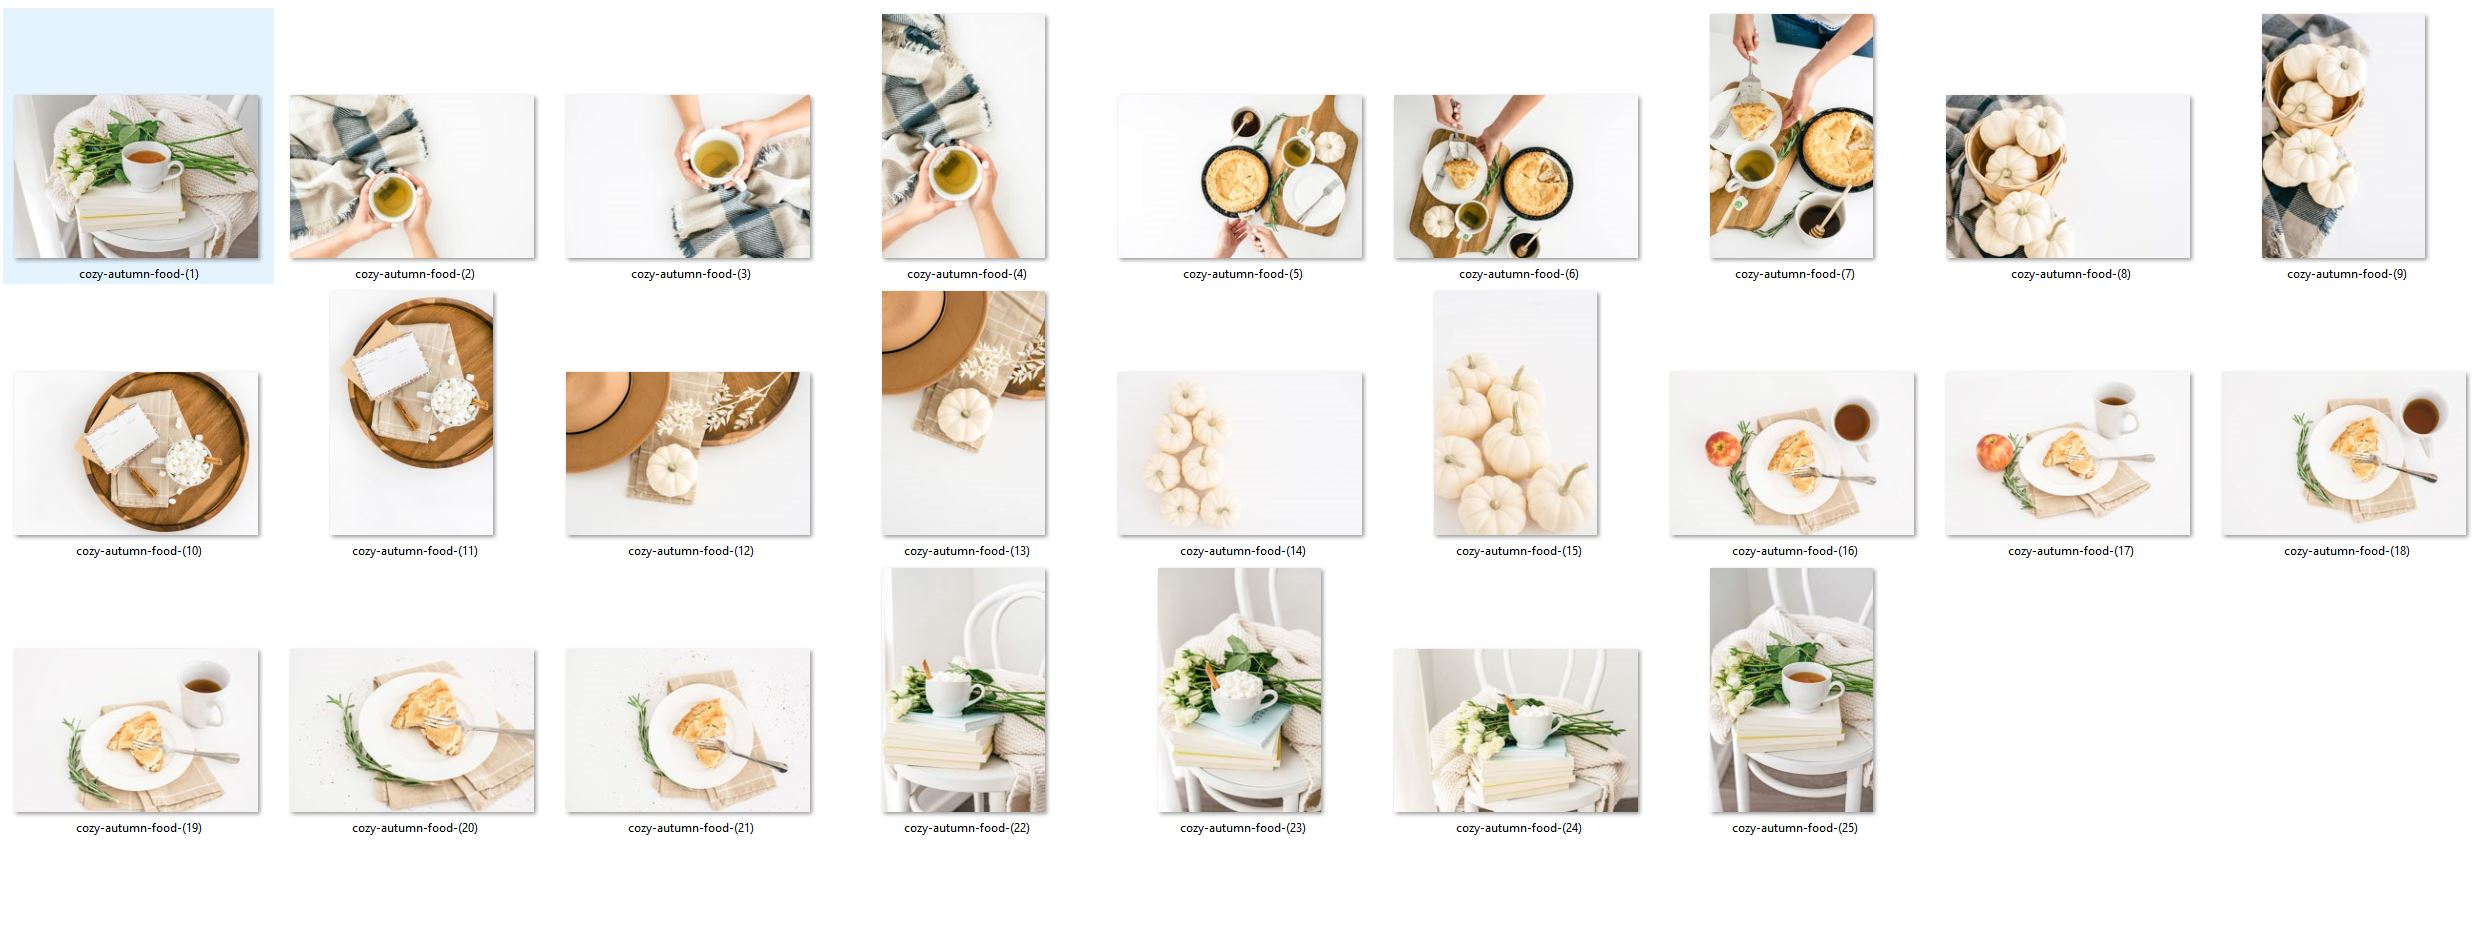 cozy autumn food style stock photos sample